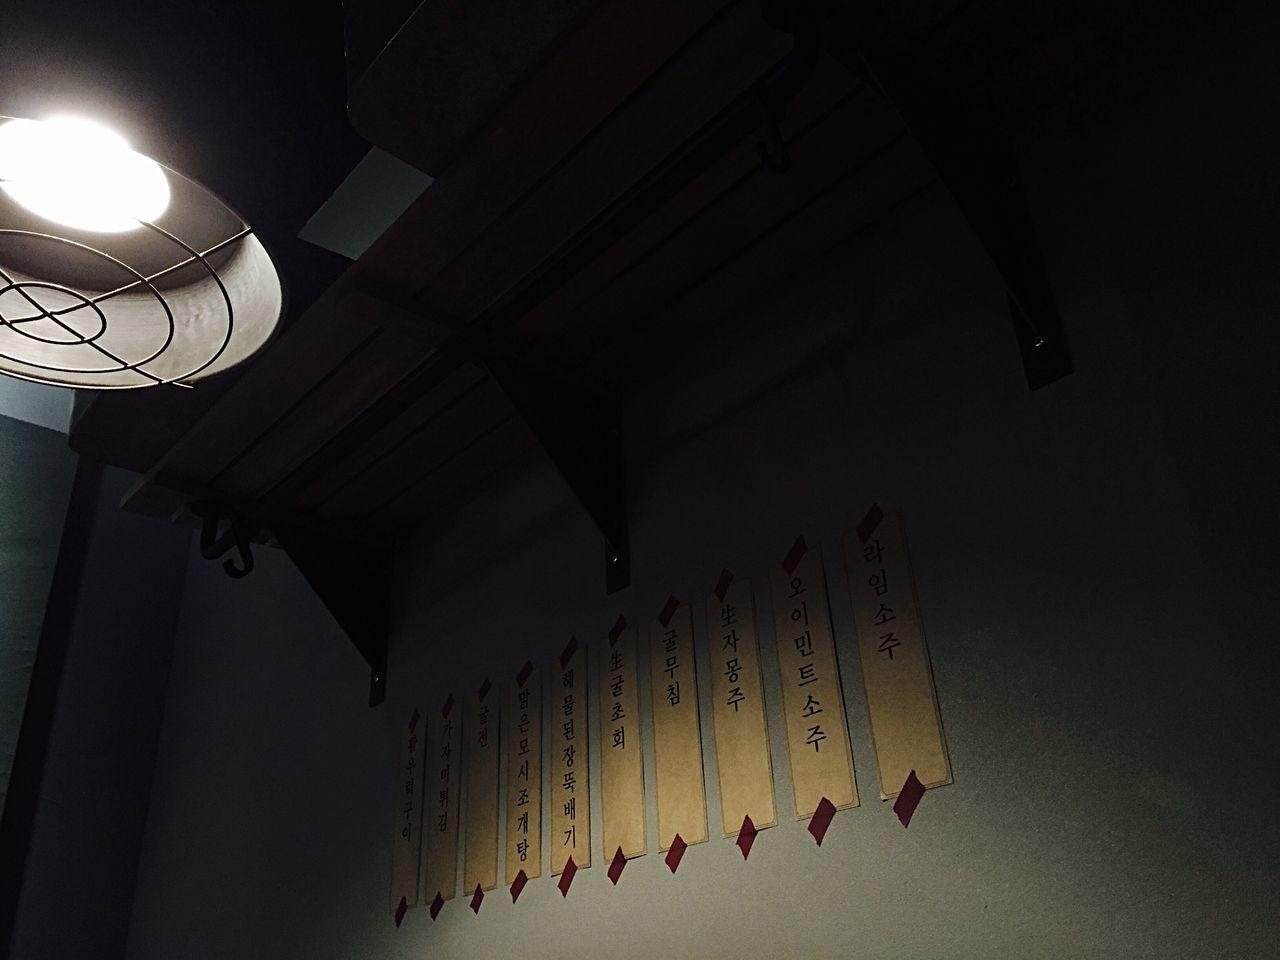 Lonley Night Nightphotography Night Lights Light Light And Shadow IPhoneography Iphonography Iphonephotography ByAlex